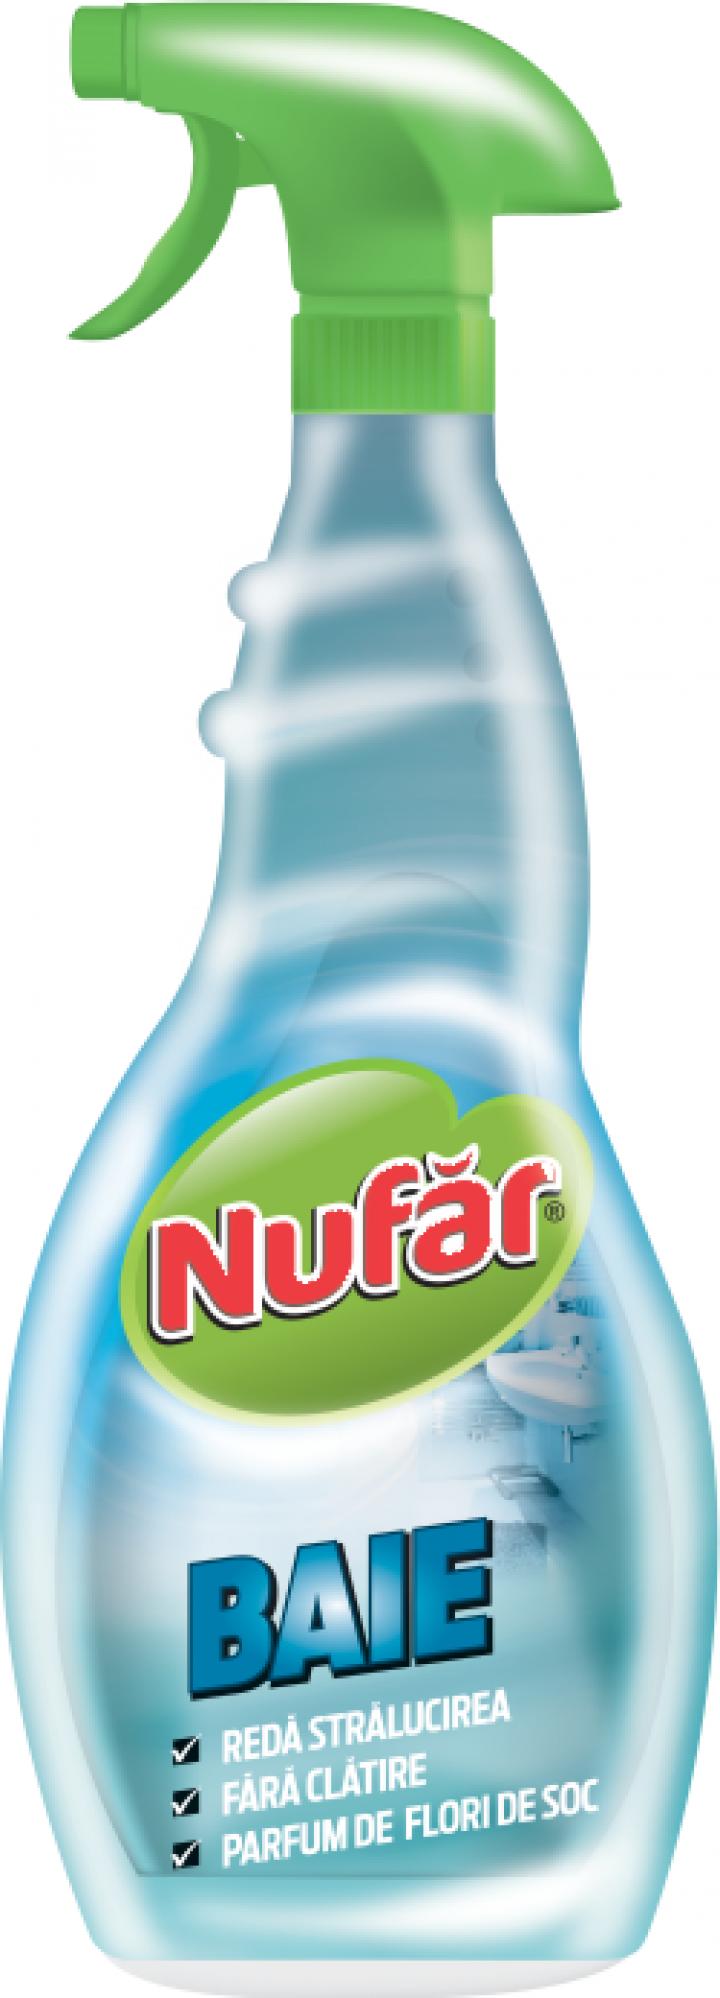 Solutie dezinfectanta pentru baie Nufar, 500 ml